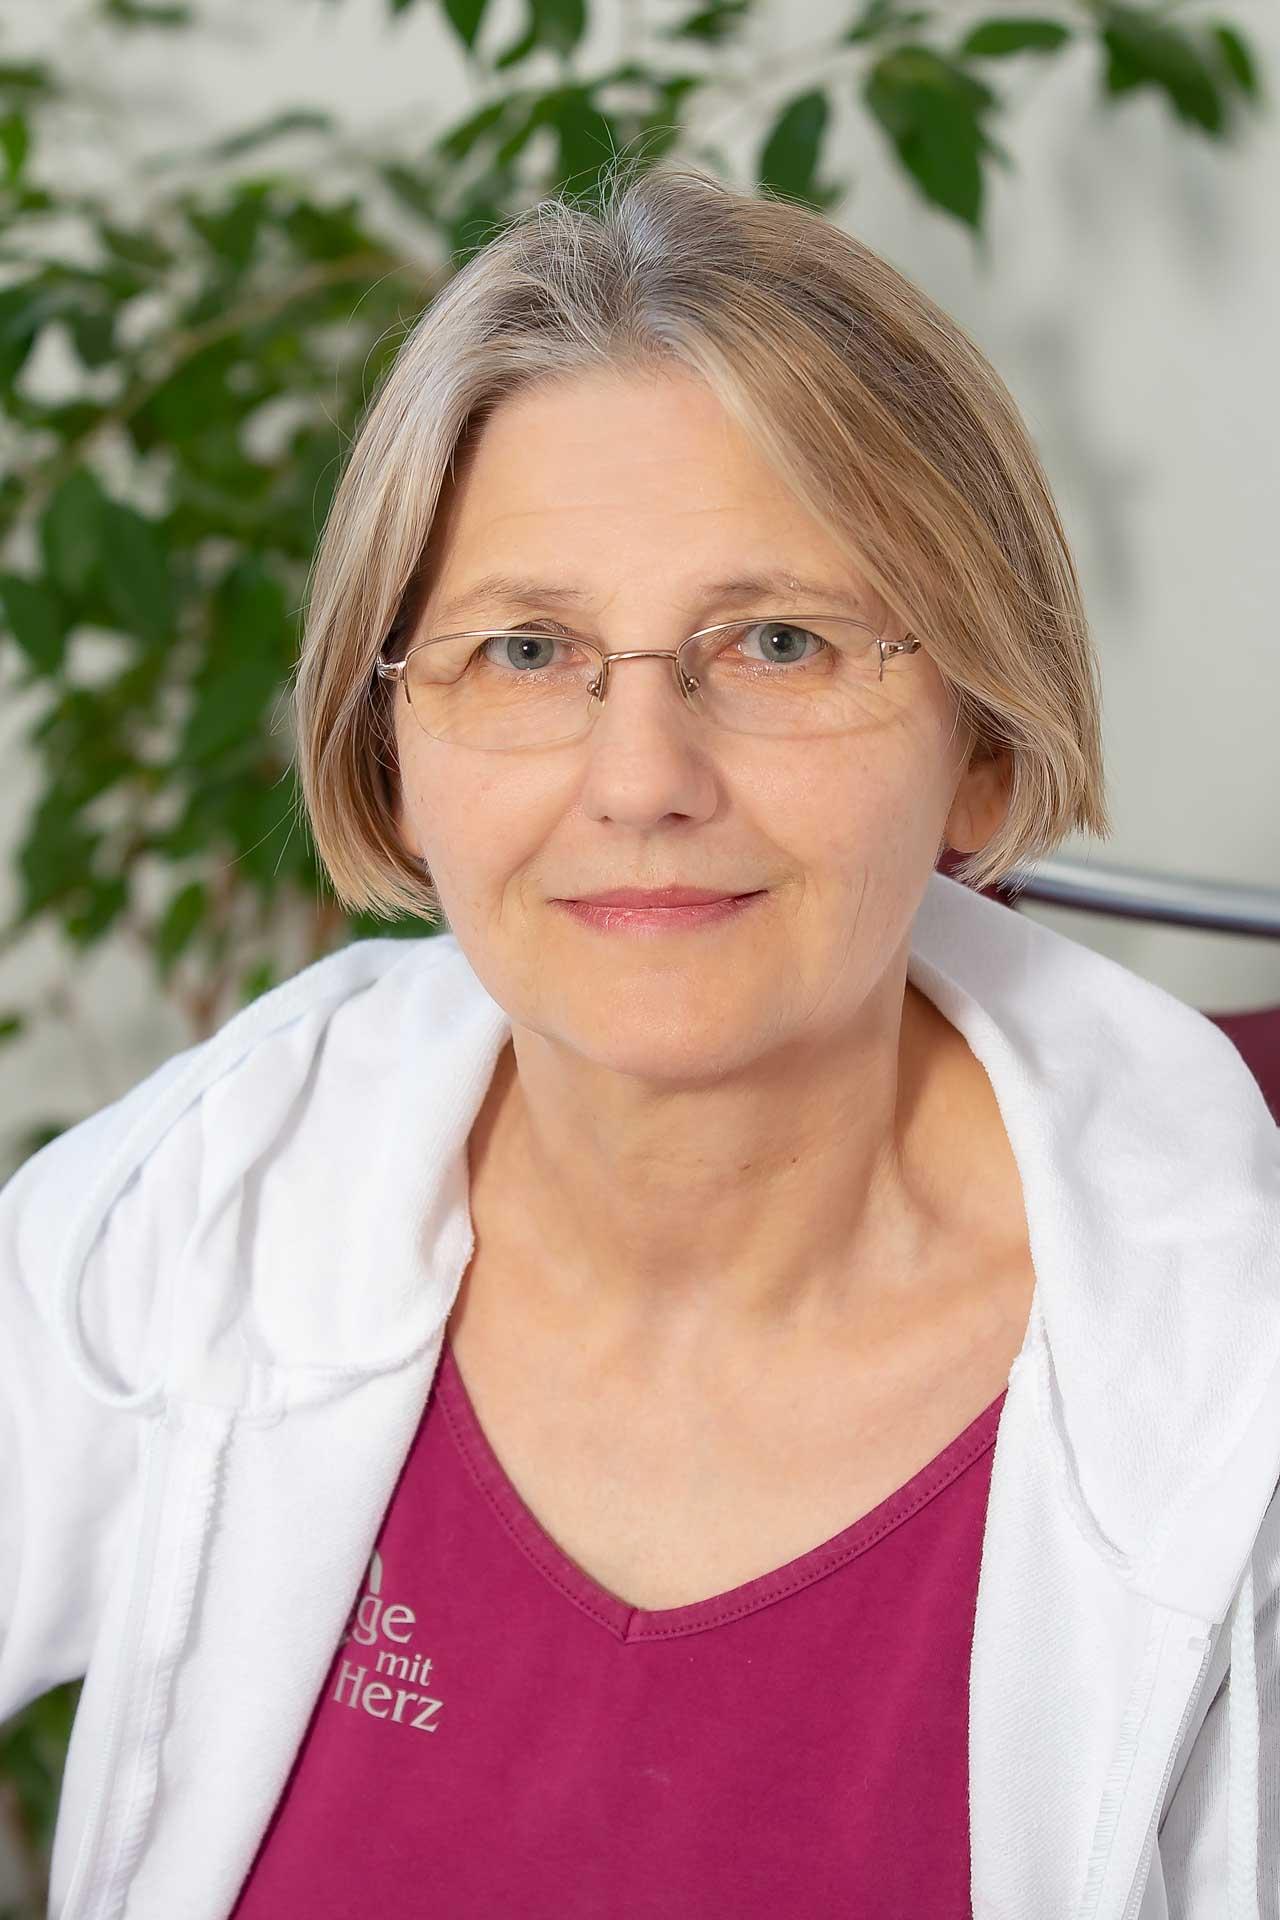 Barbara Schuchert